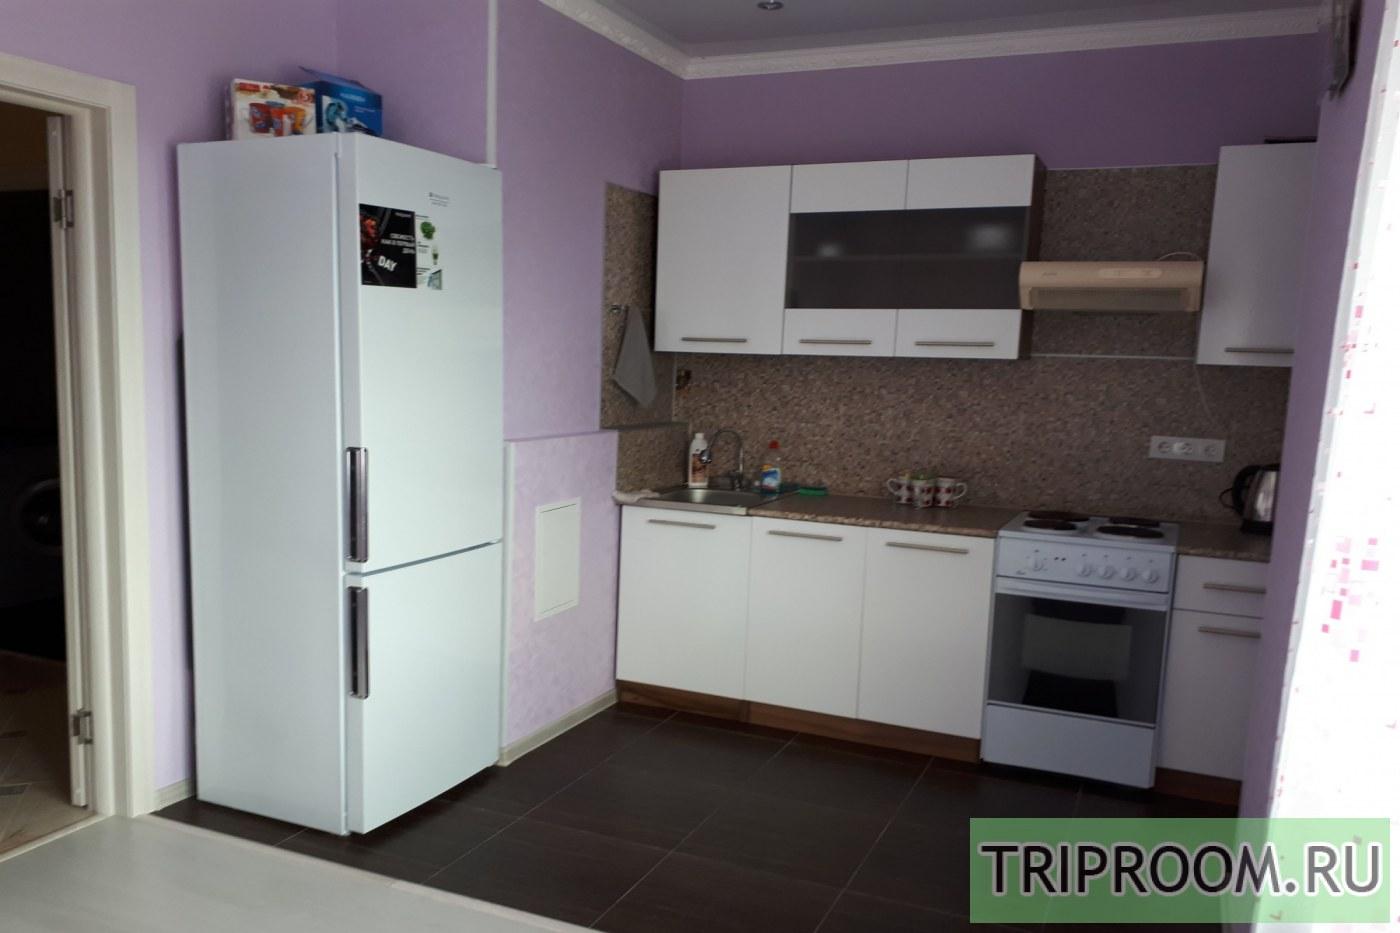 2-комнатная квартира посуточно (вариант № 39032), ул. Симиренко улица, фото № 6